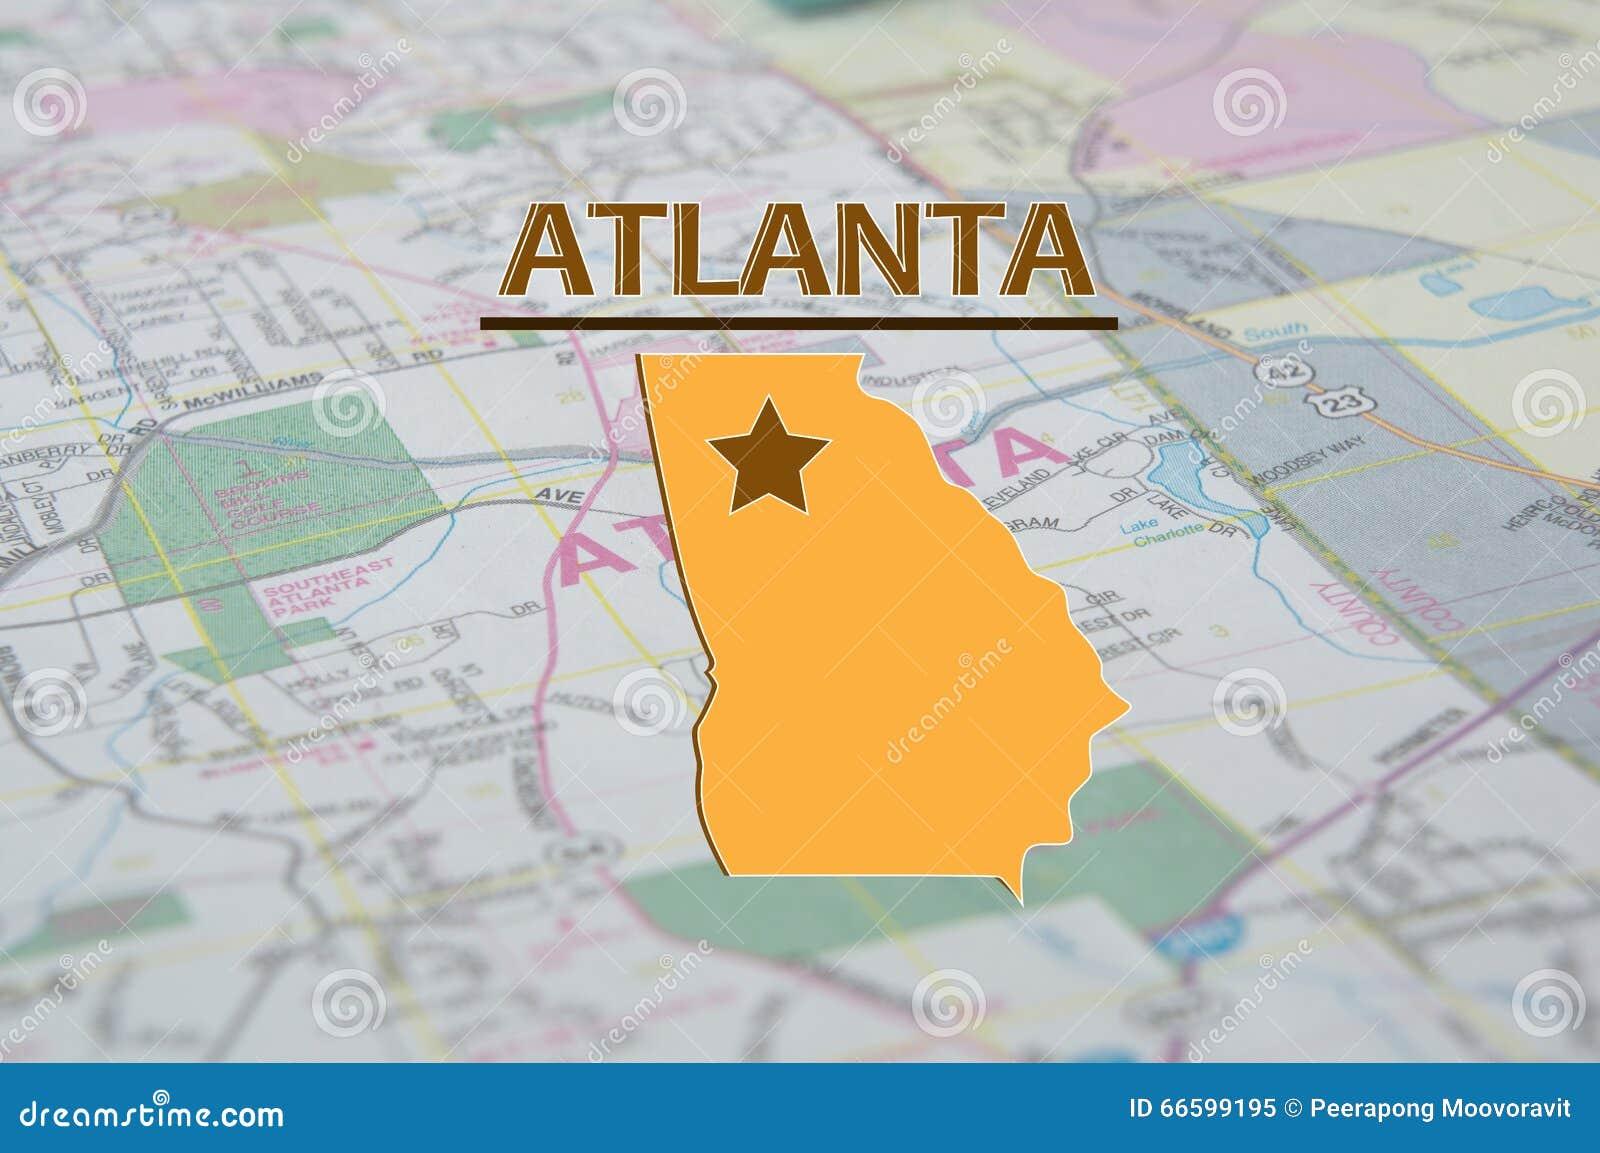 City Map Of Atlanta Georgia.Map Of Atlanta Georgia Stock Image Image Of America 66599195